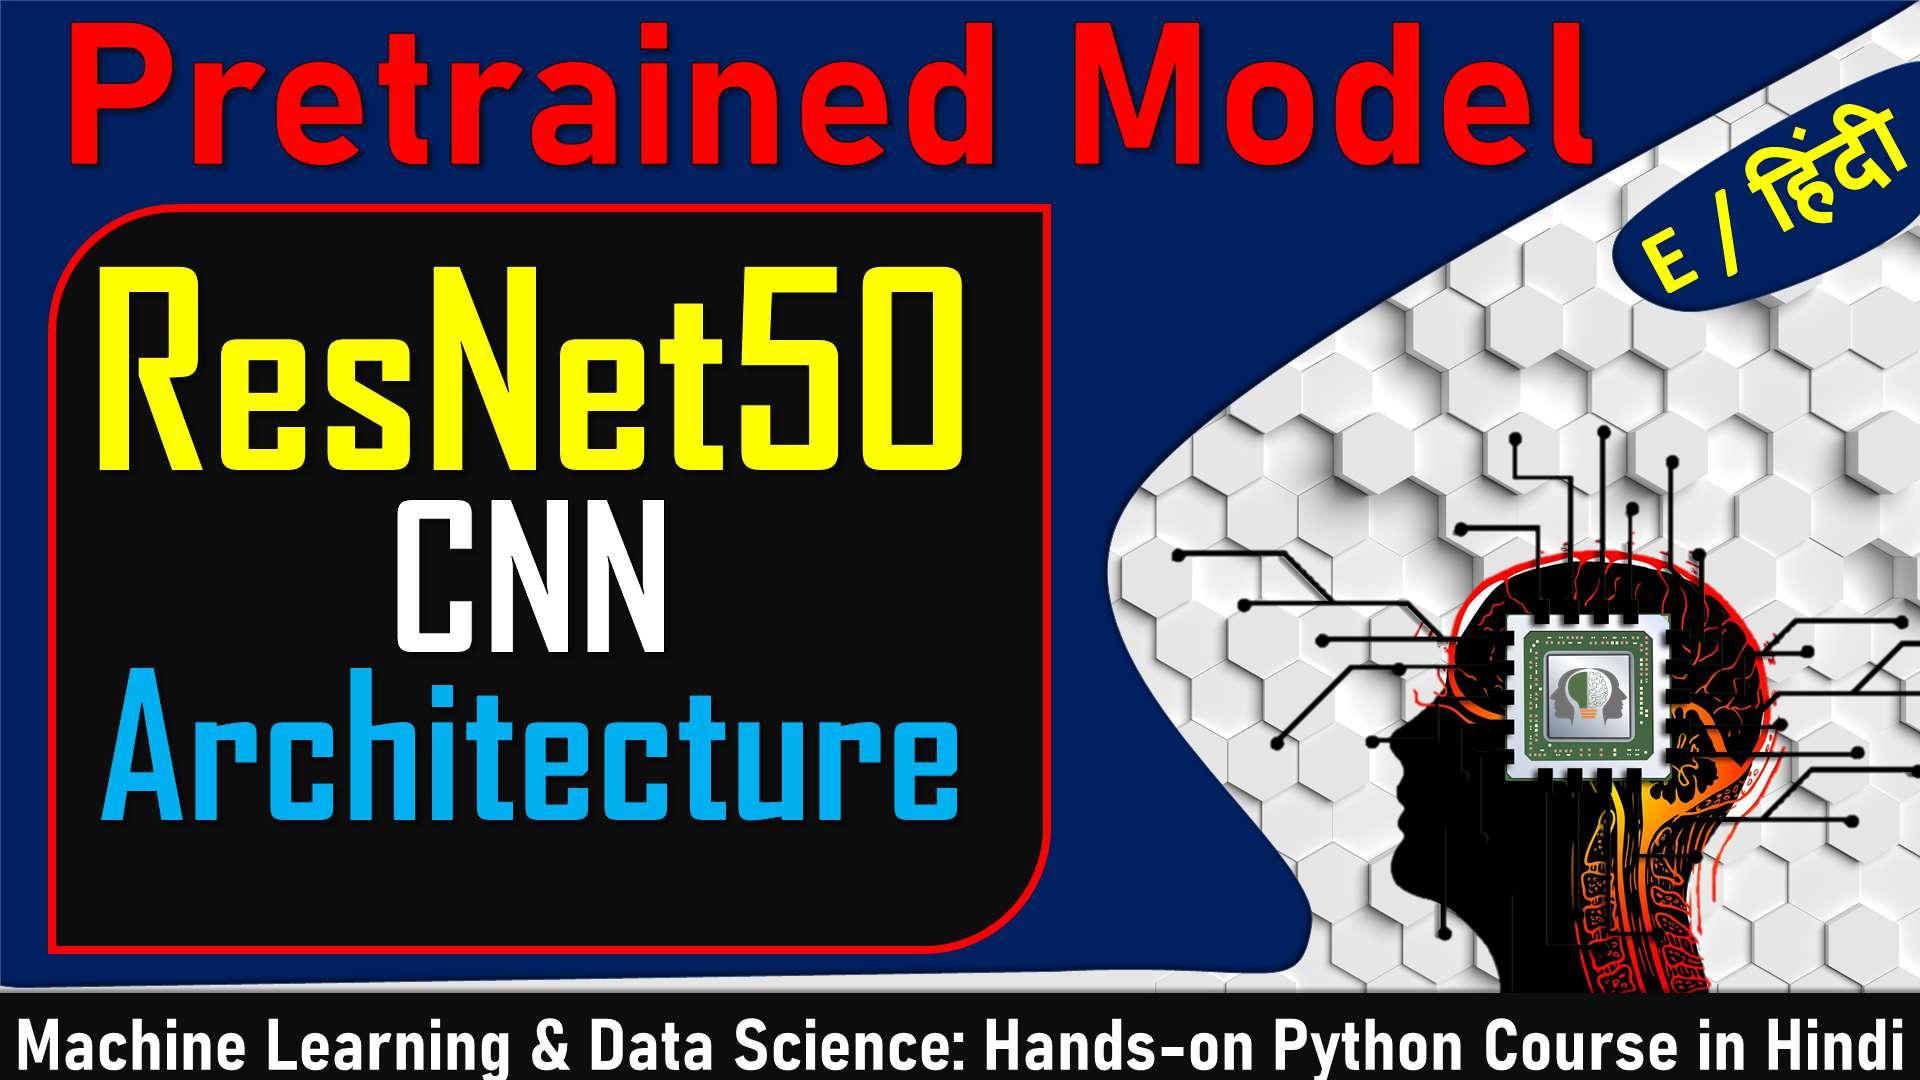 resnet50_